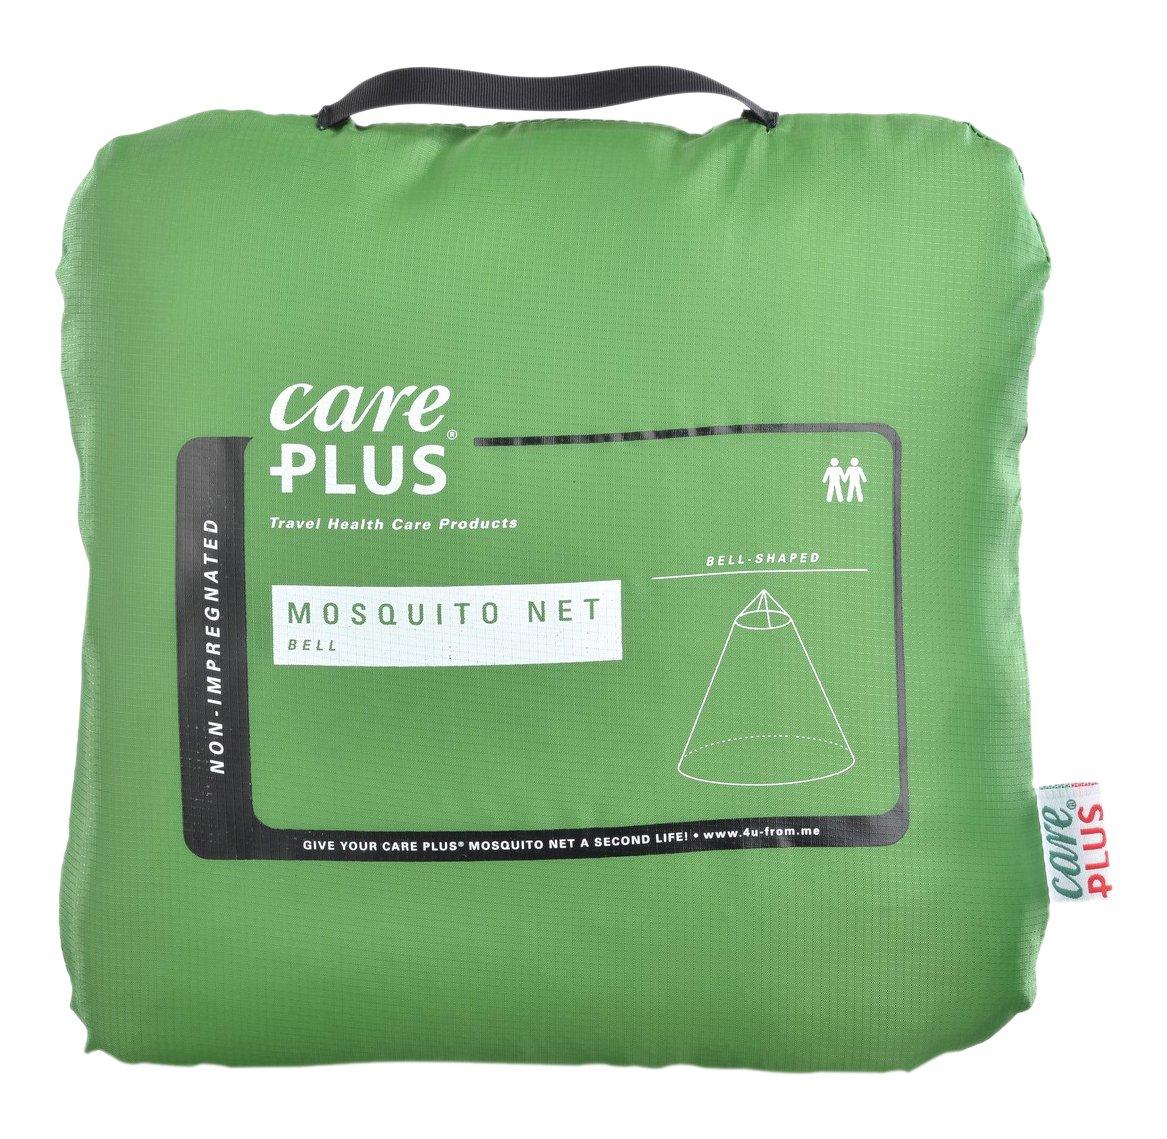 /Moustiquaire tropicare Care Plus Mosquito Net Bell Pyramide/